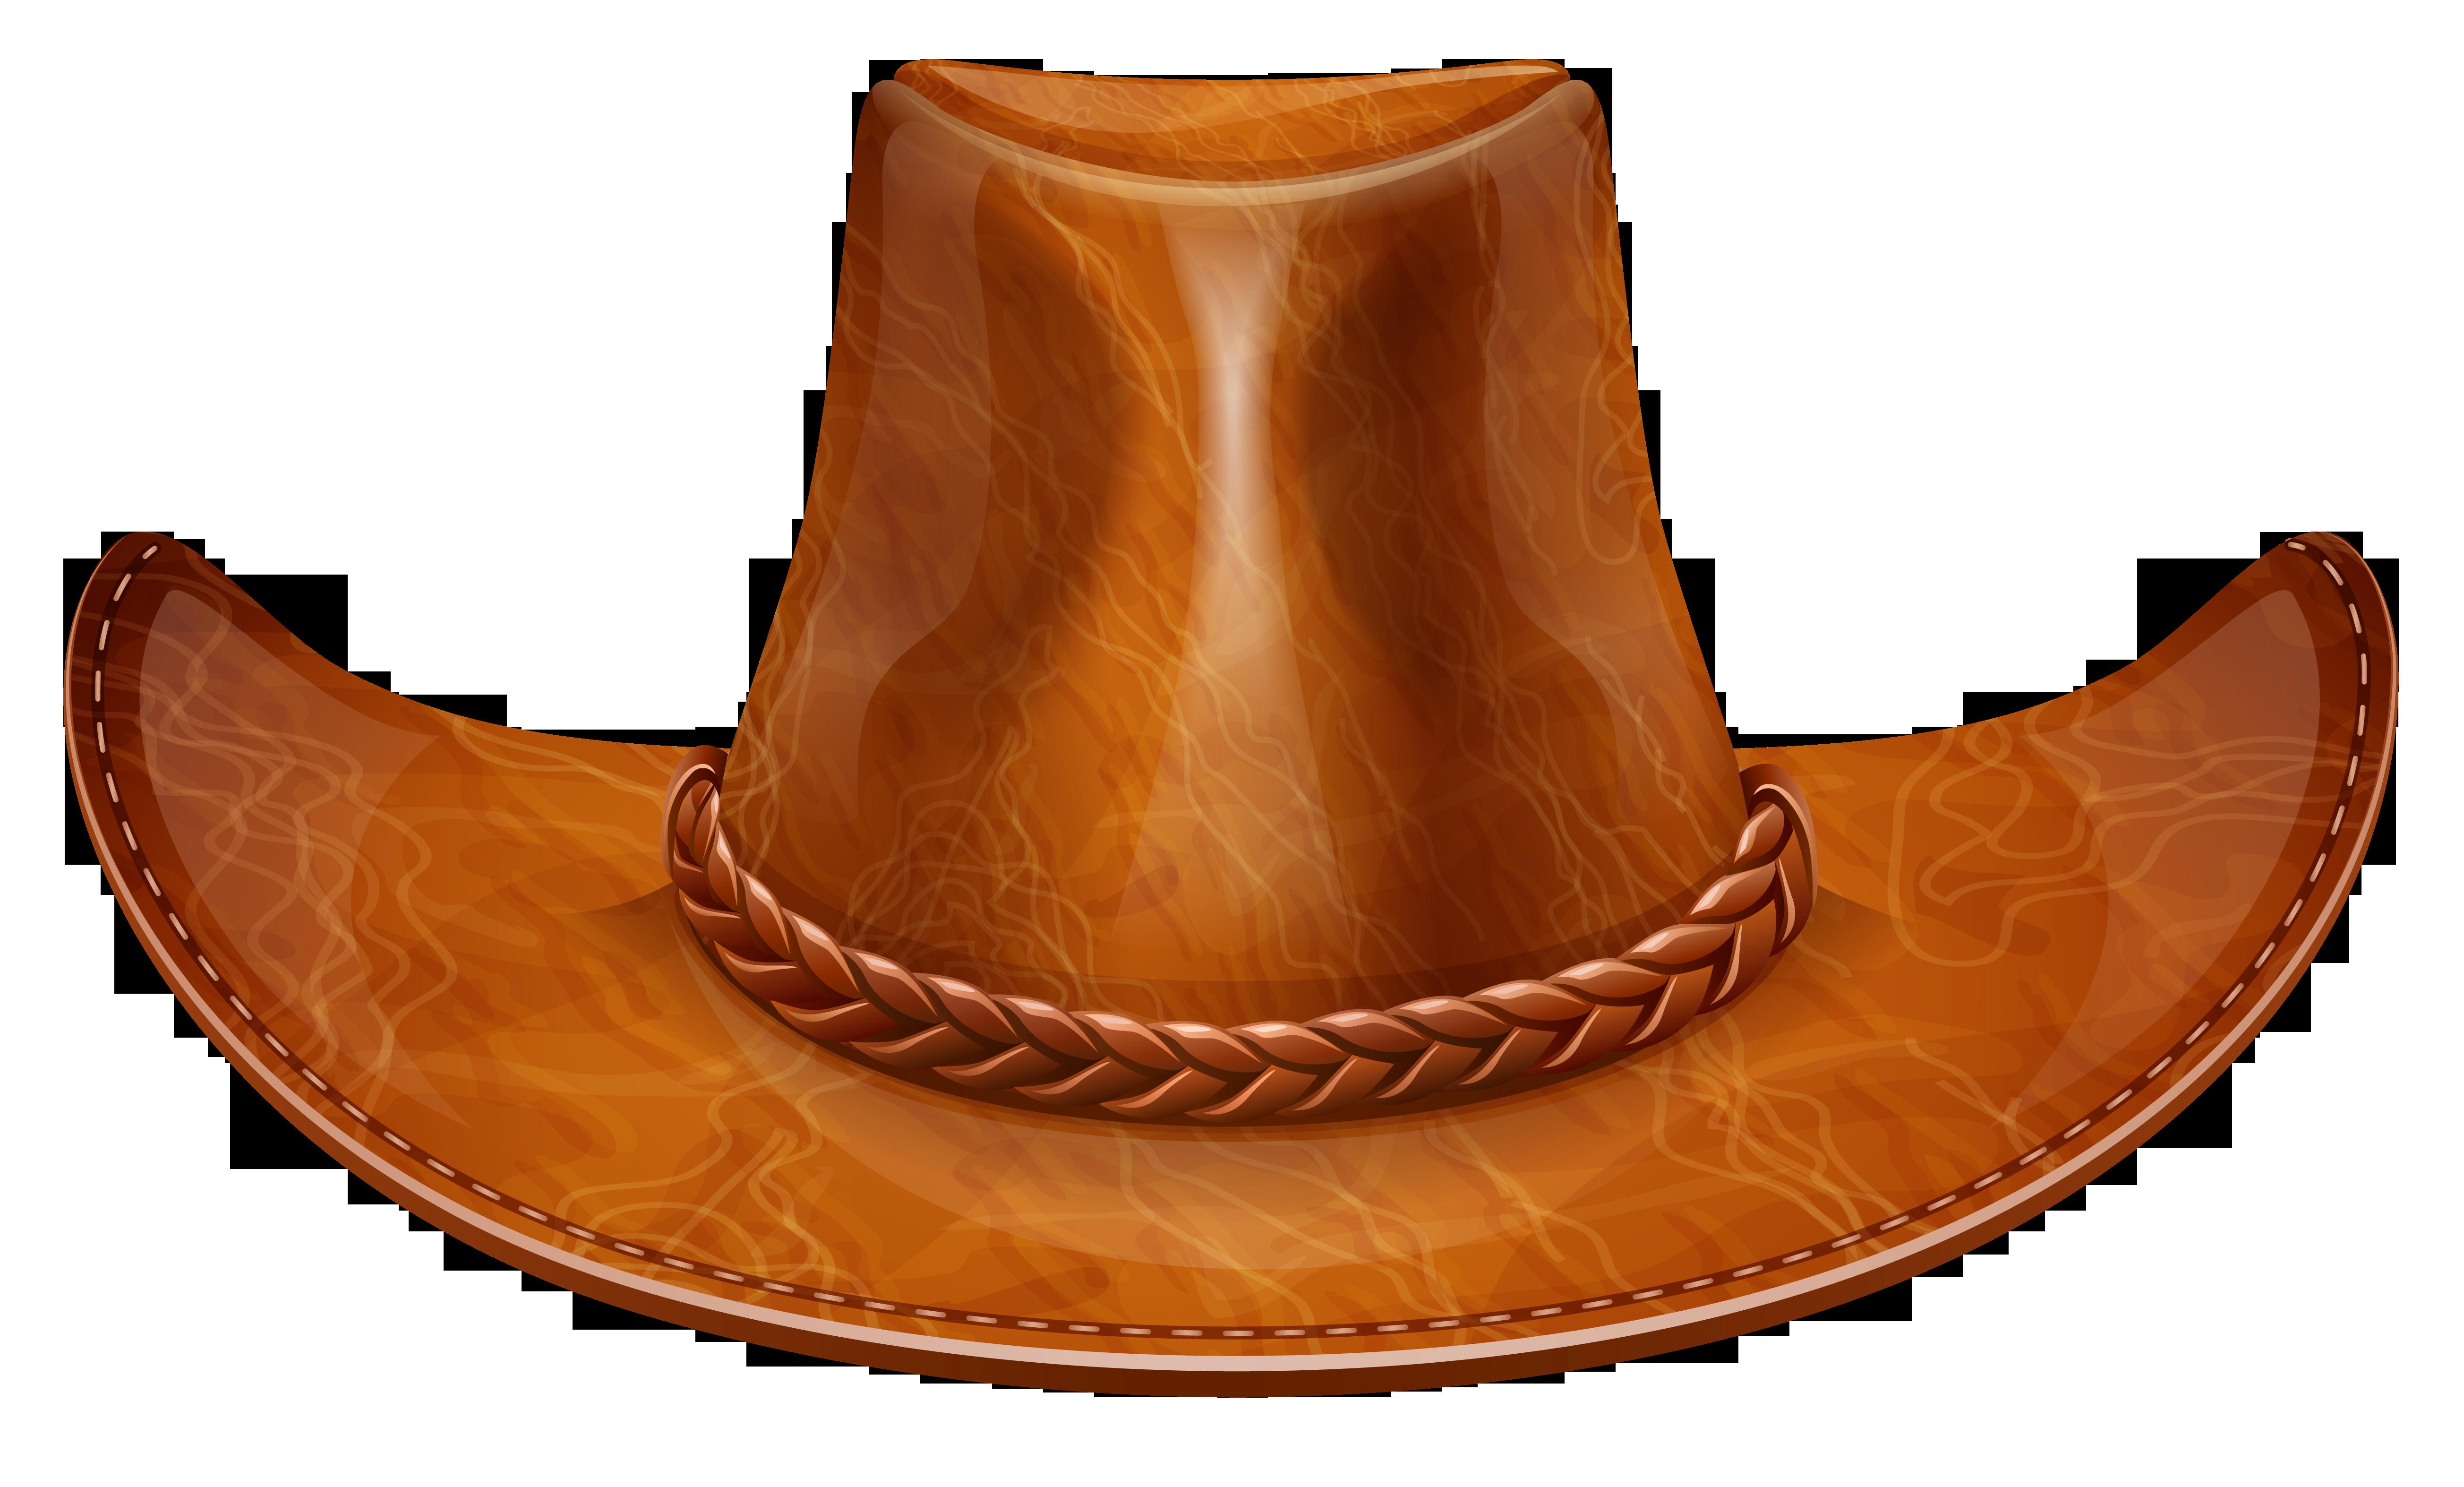 Brown cowboy hat png. Hats clipart cow boy